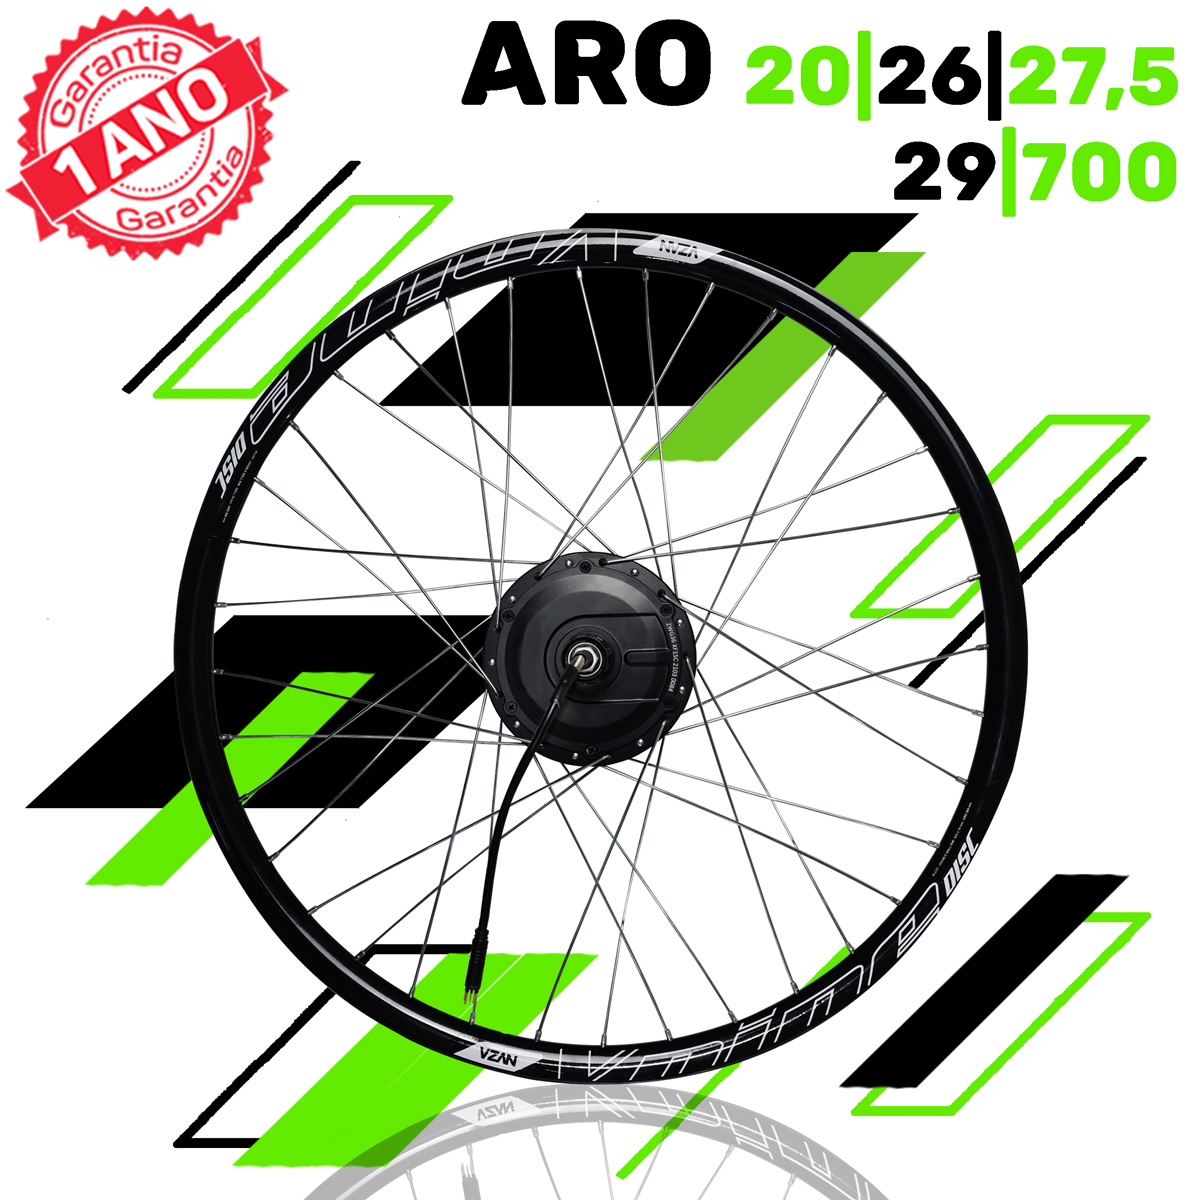 Kit Elétrico para Bicicleta - TecBike - 500 Watts 36V - Aro 26